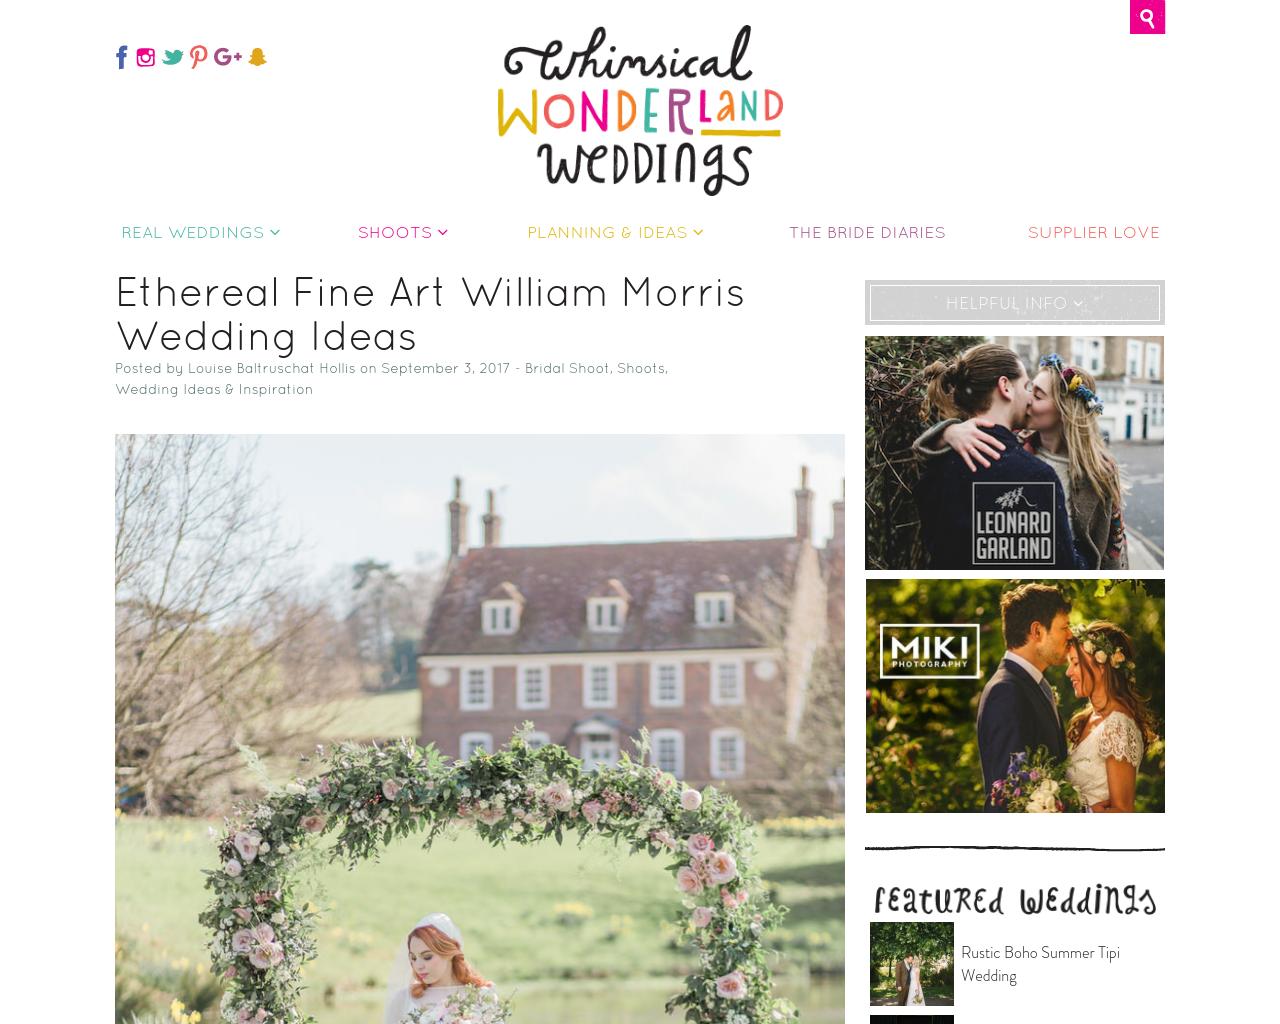 Whimsical-Wonderland-Weddings-Advertising-Reviews-Pricing